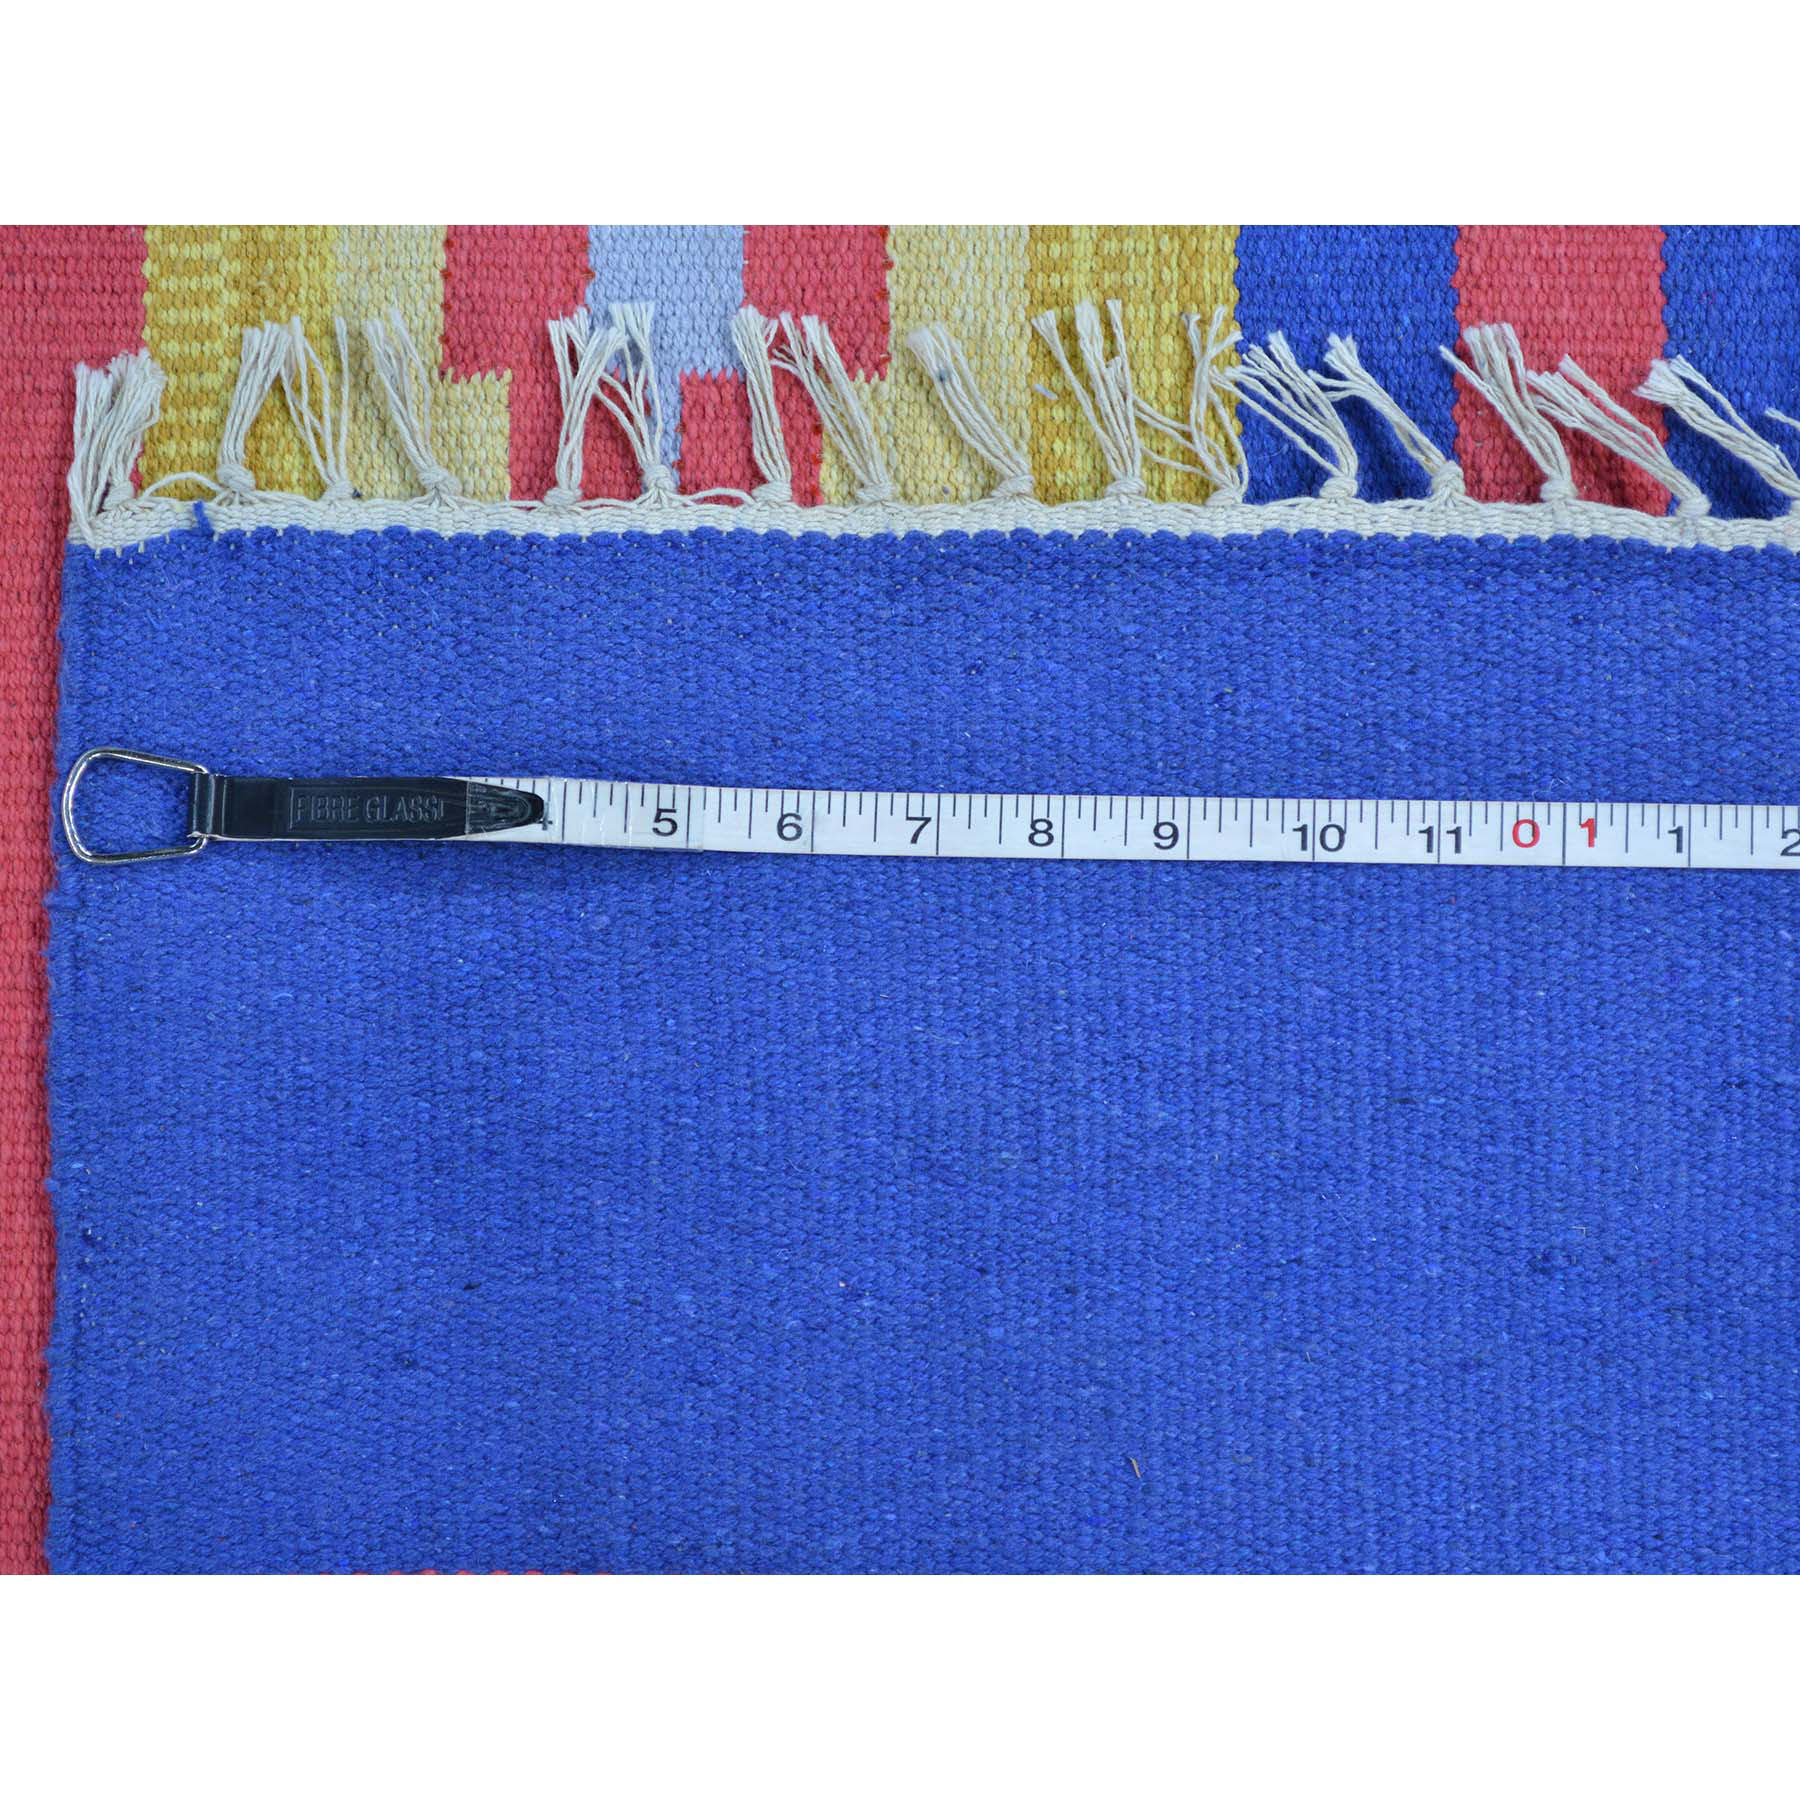 8-10 x12- Southwestern Design Flat Weave Hand Woven Killim Rug